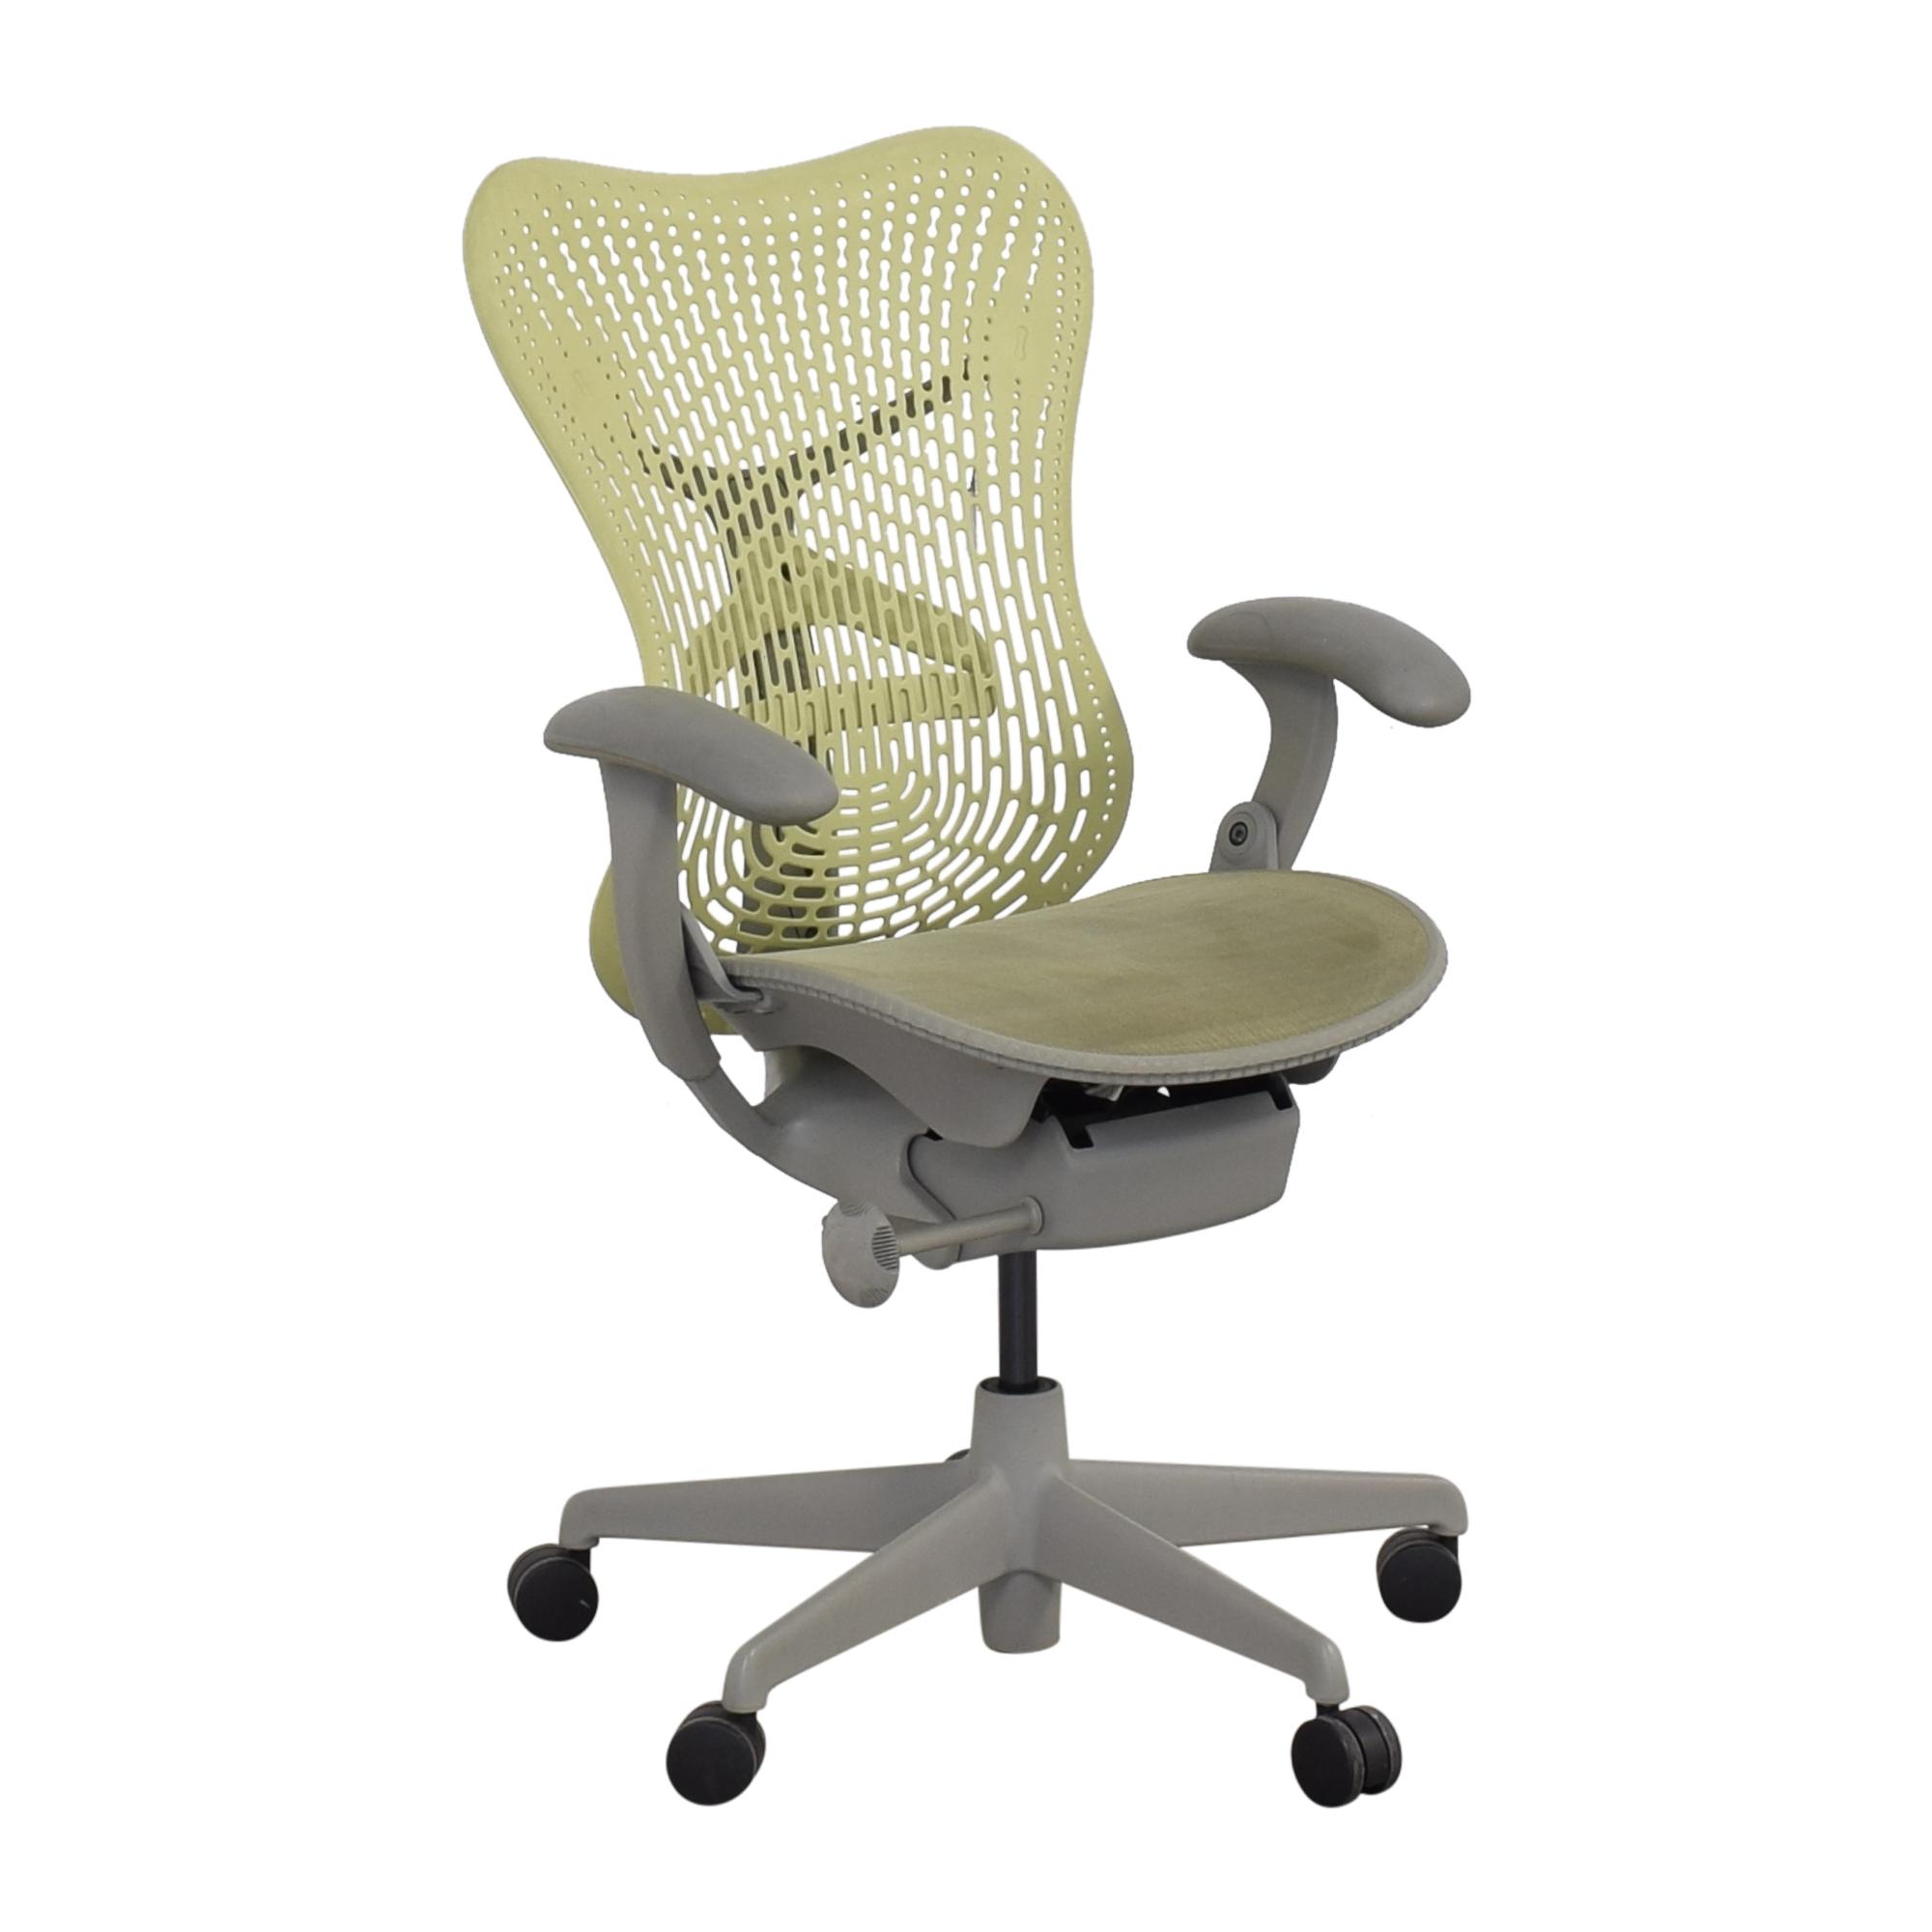 Herman Miller Herman Miller Mirra Chair green and grey